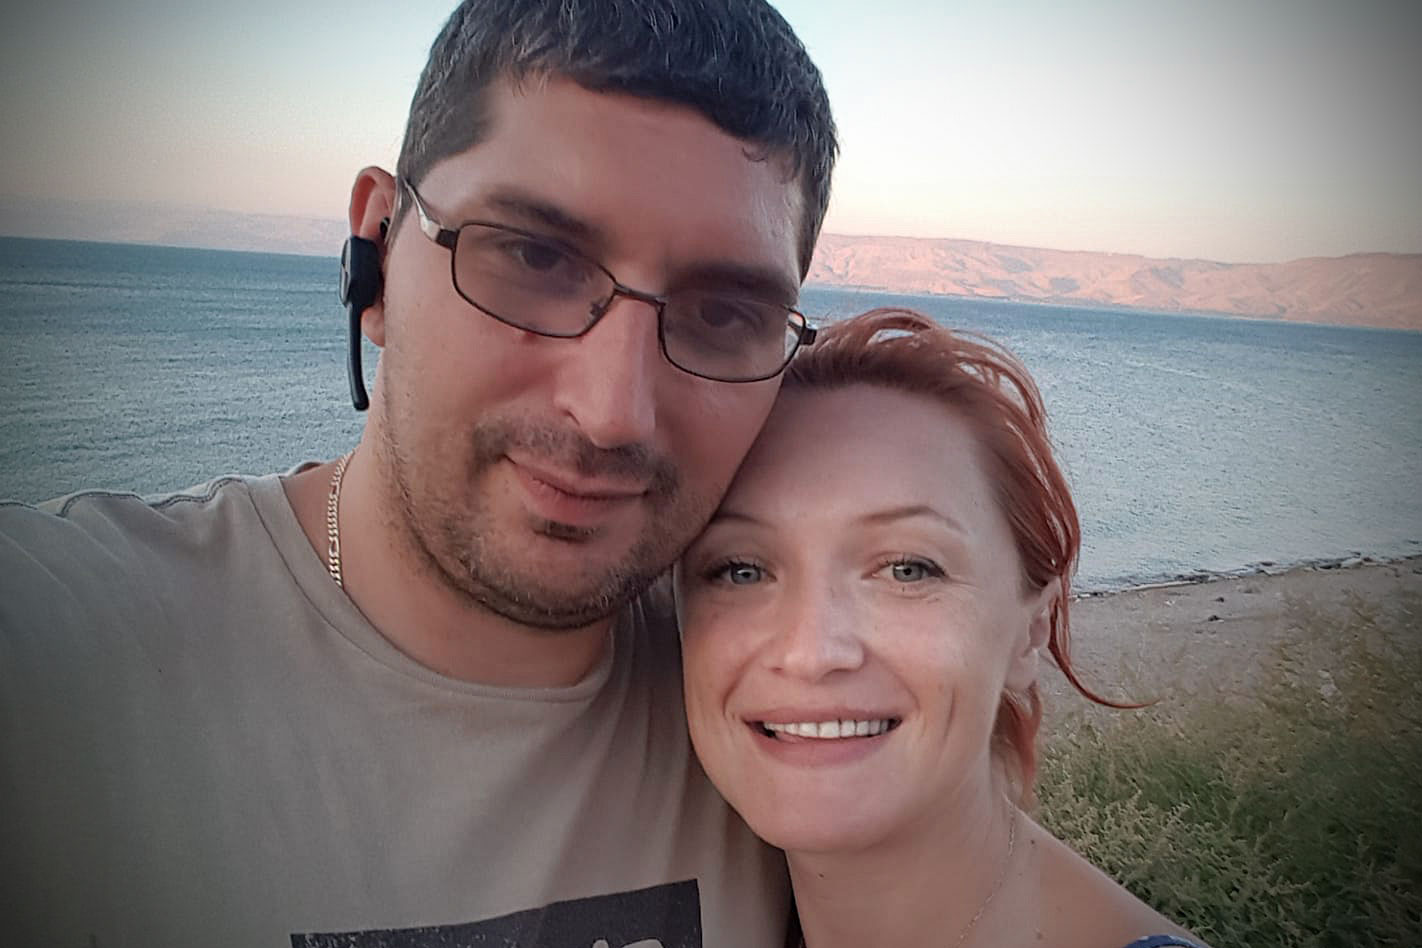 <strong>MICHAEL AND NATALIA MILEVSKI</strong>